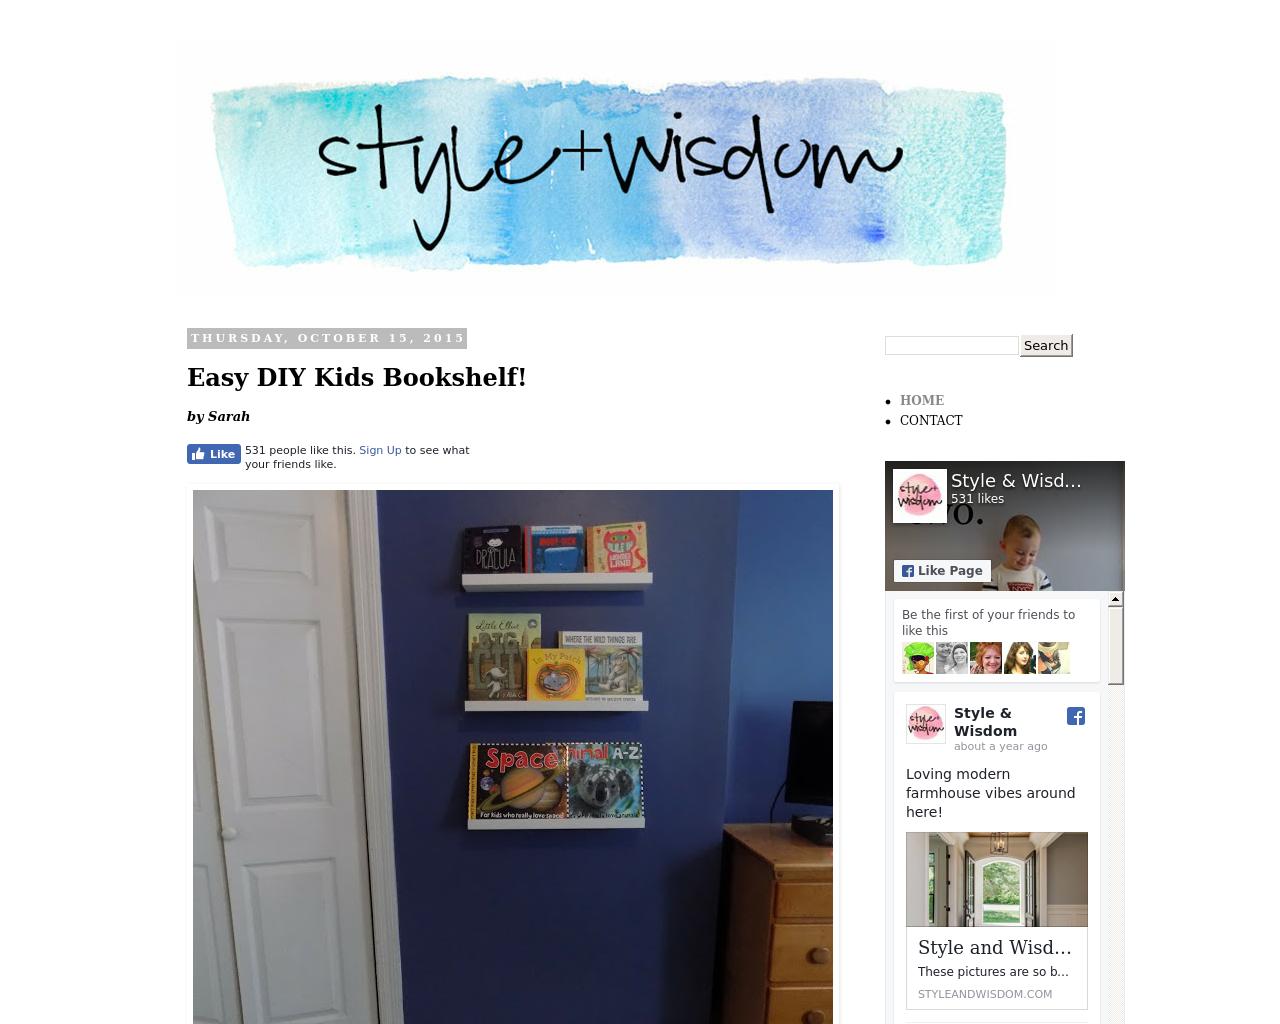 Style-&-Wisdom-Advertising-Reviews-Pricing